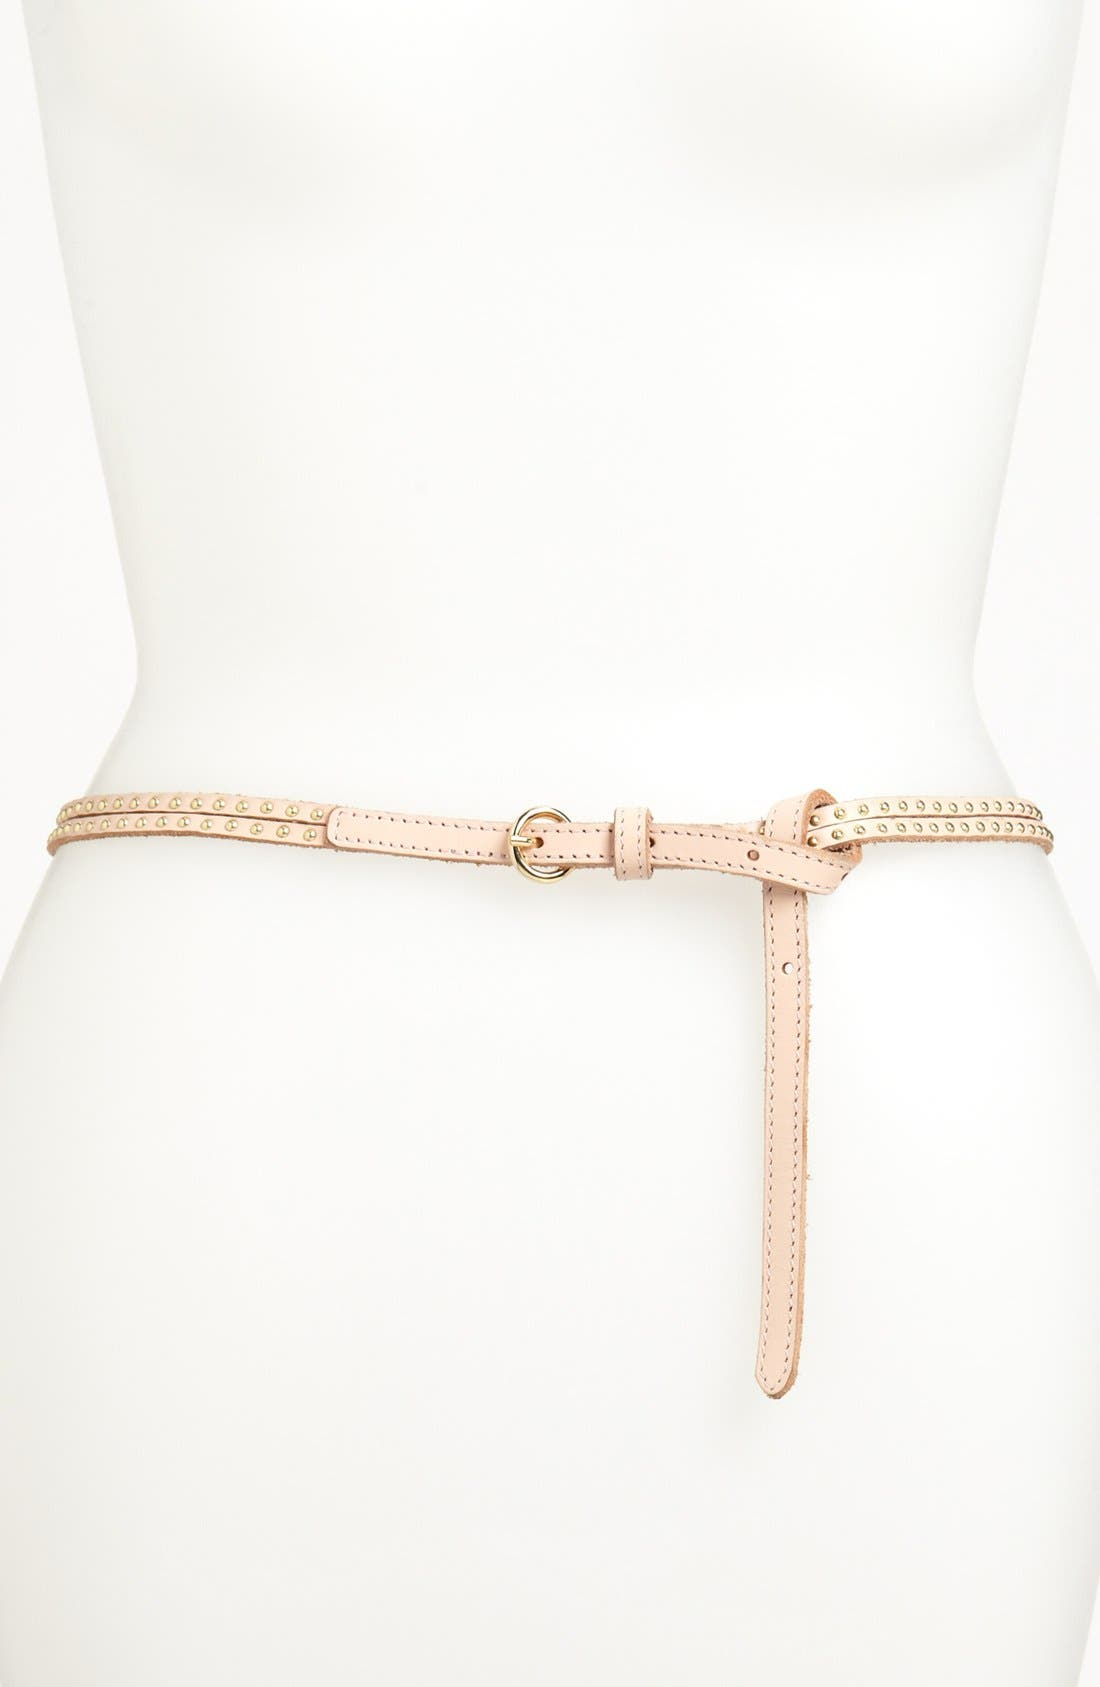 Main Image - Tarnish Skinny Stud Double Strap Belt